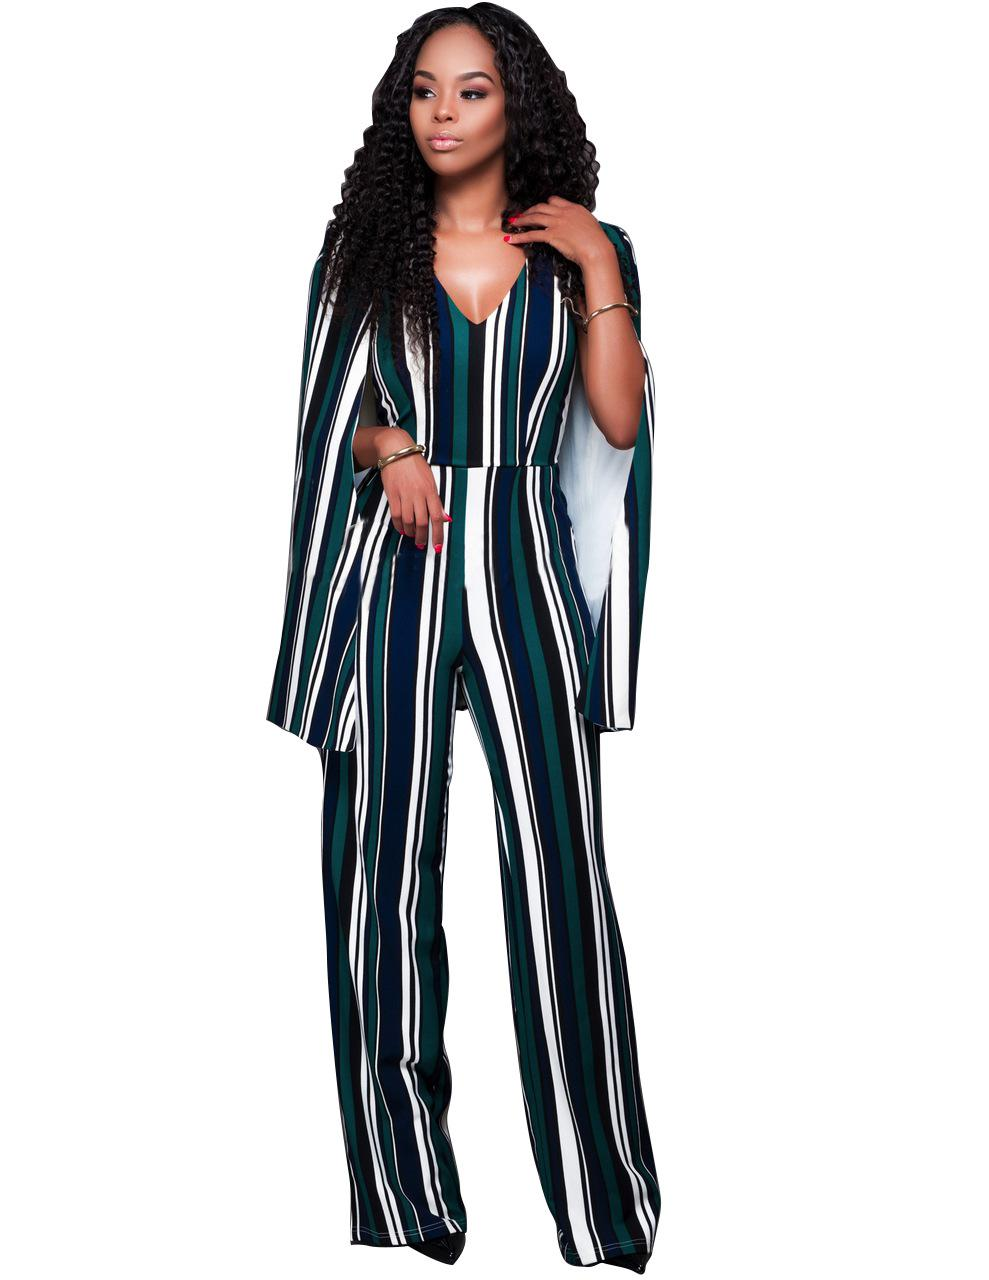 21b3e56c95 Best Quality Wholesale Women Cap Cloak Sleeve Long Jumpsuit Sexy Striped  Patchwork Deep V Neck Open Back Wide Leg Playsuits Plus Size Overalls At  Cheap ...